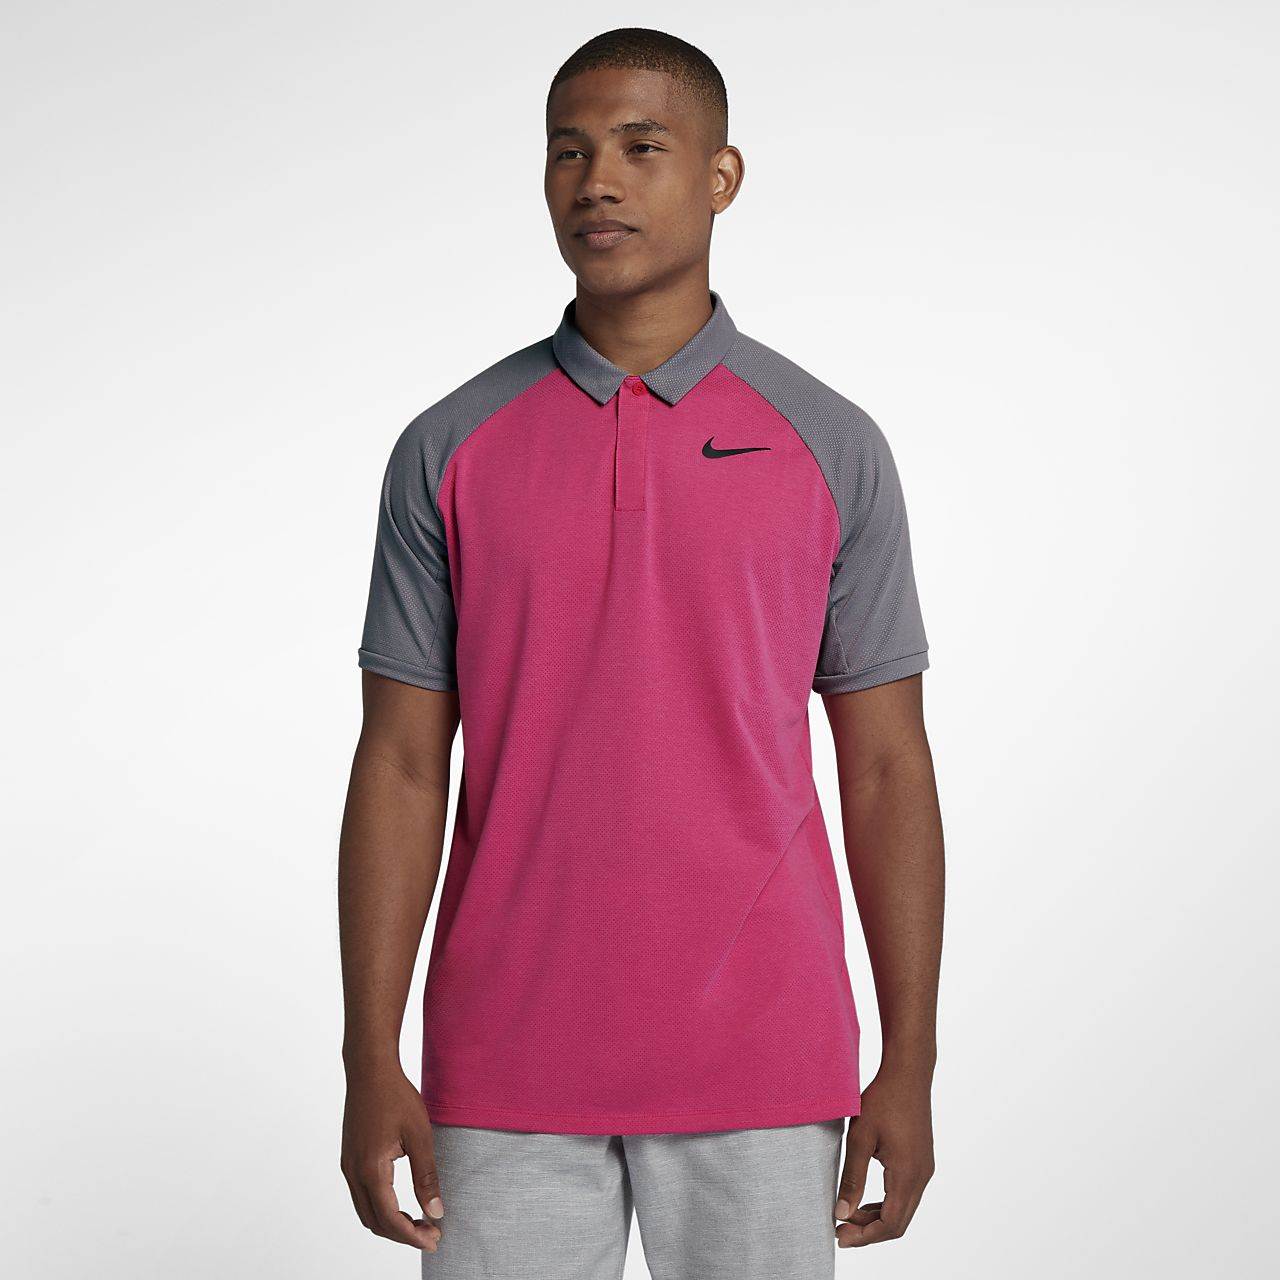 Nike Dri-FIT golfskjorte i standard passform for herre